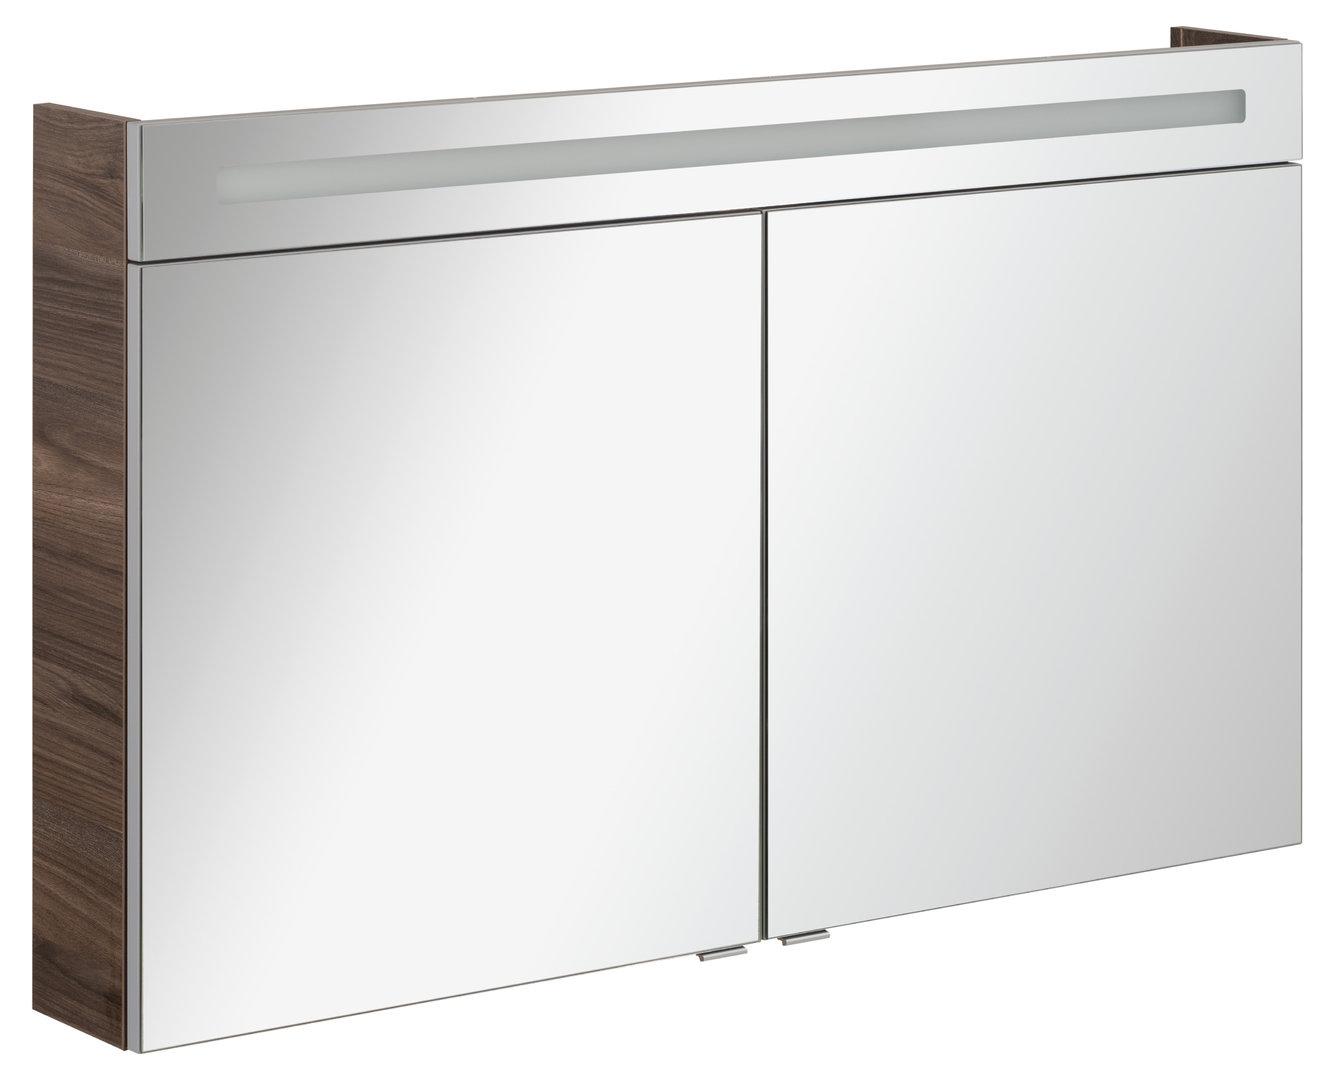 fackelmann led spiegelschrank 10 6 watt 120 breite alask. Black Bedroom Furniture Sets. Home Design Ideas